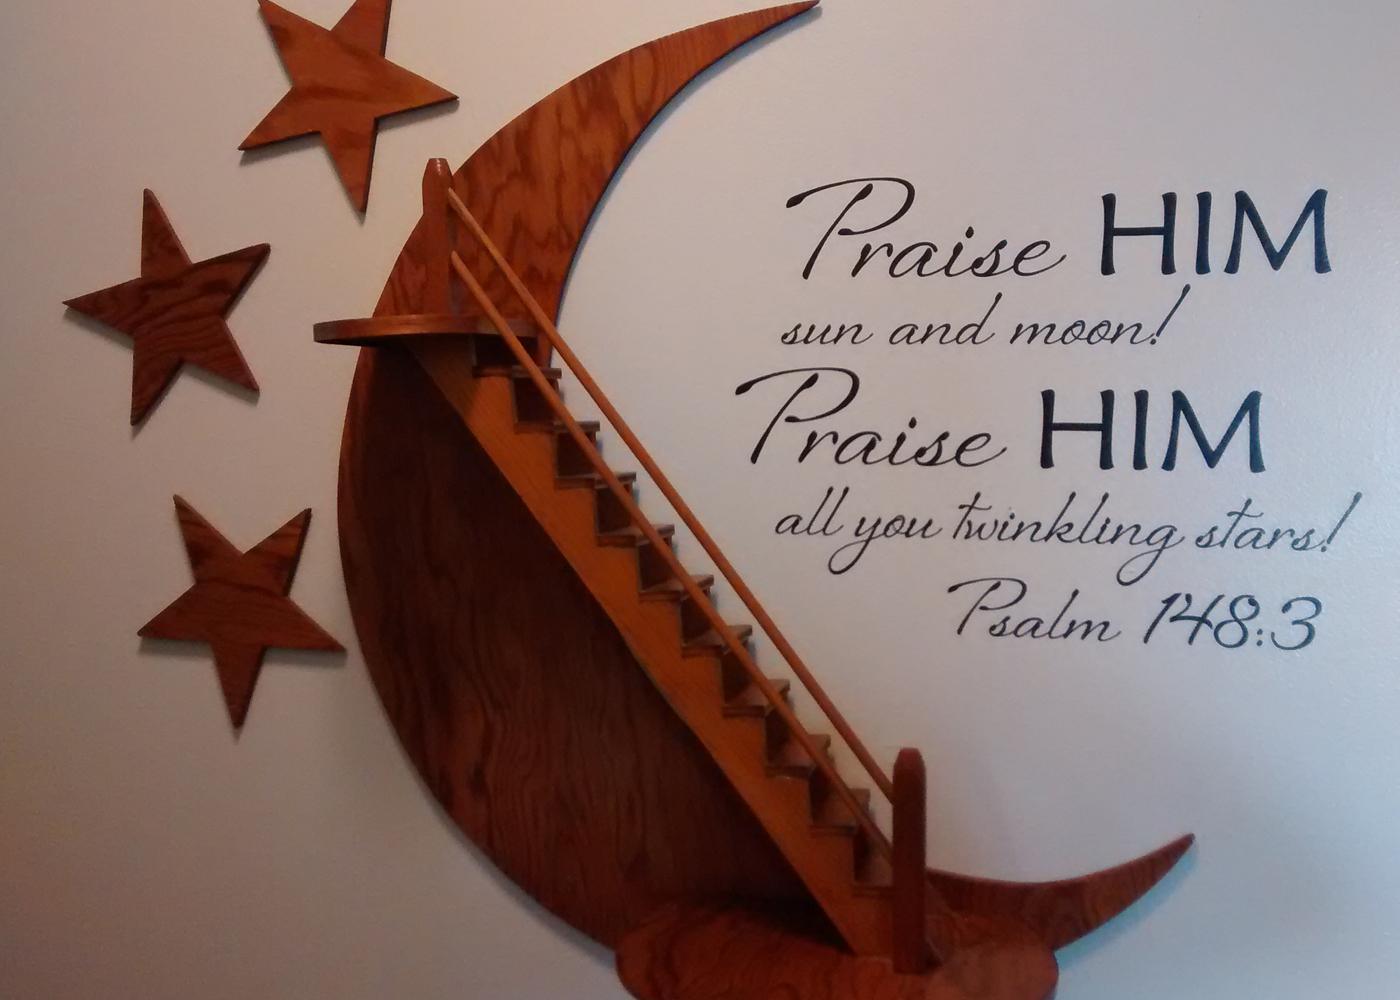 praise-him-custom-wall-word-decal-lettering.jpg